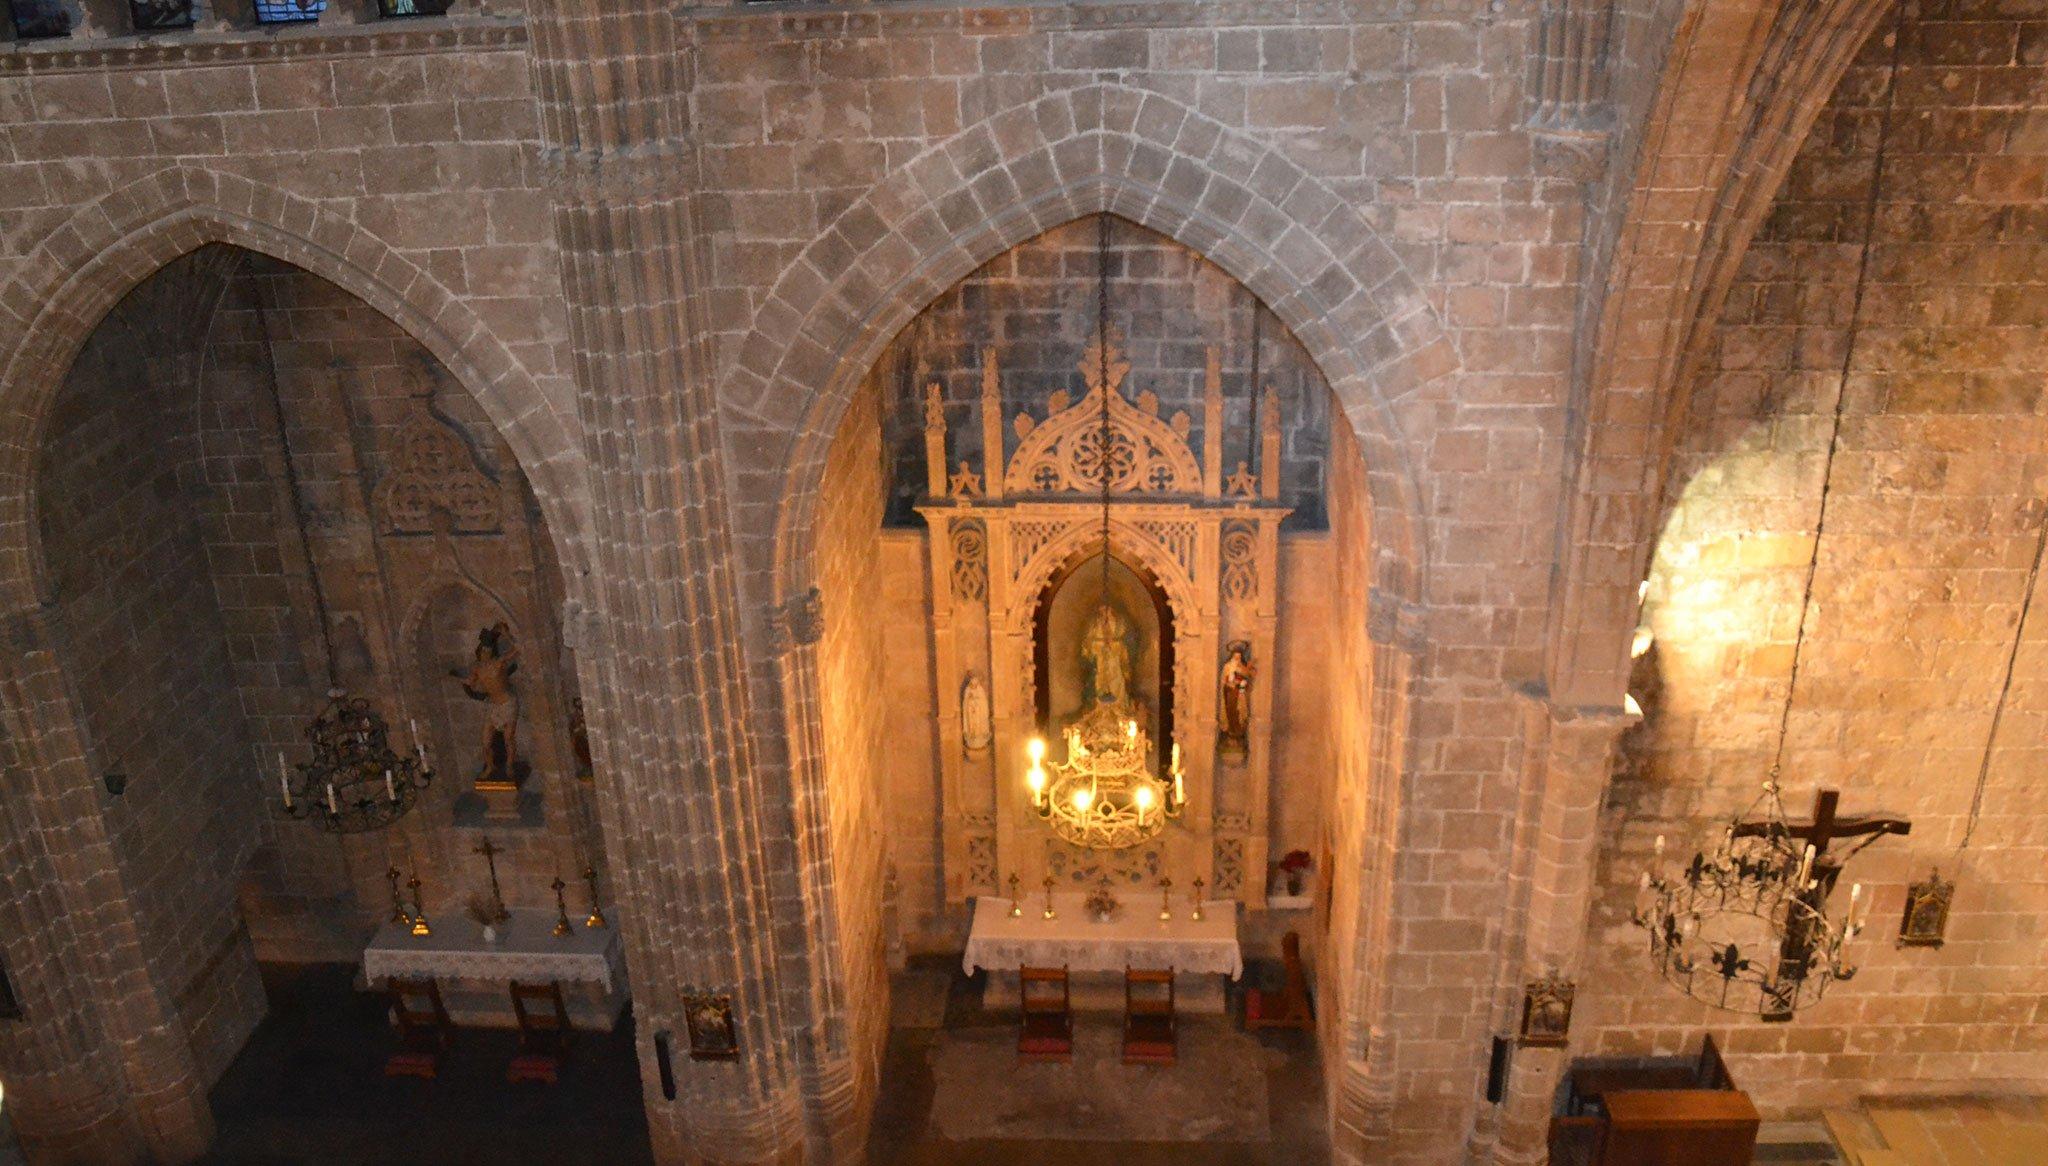 Capillas laterales en la iglesia de San Bartolomé de Jávea